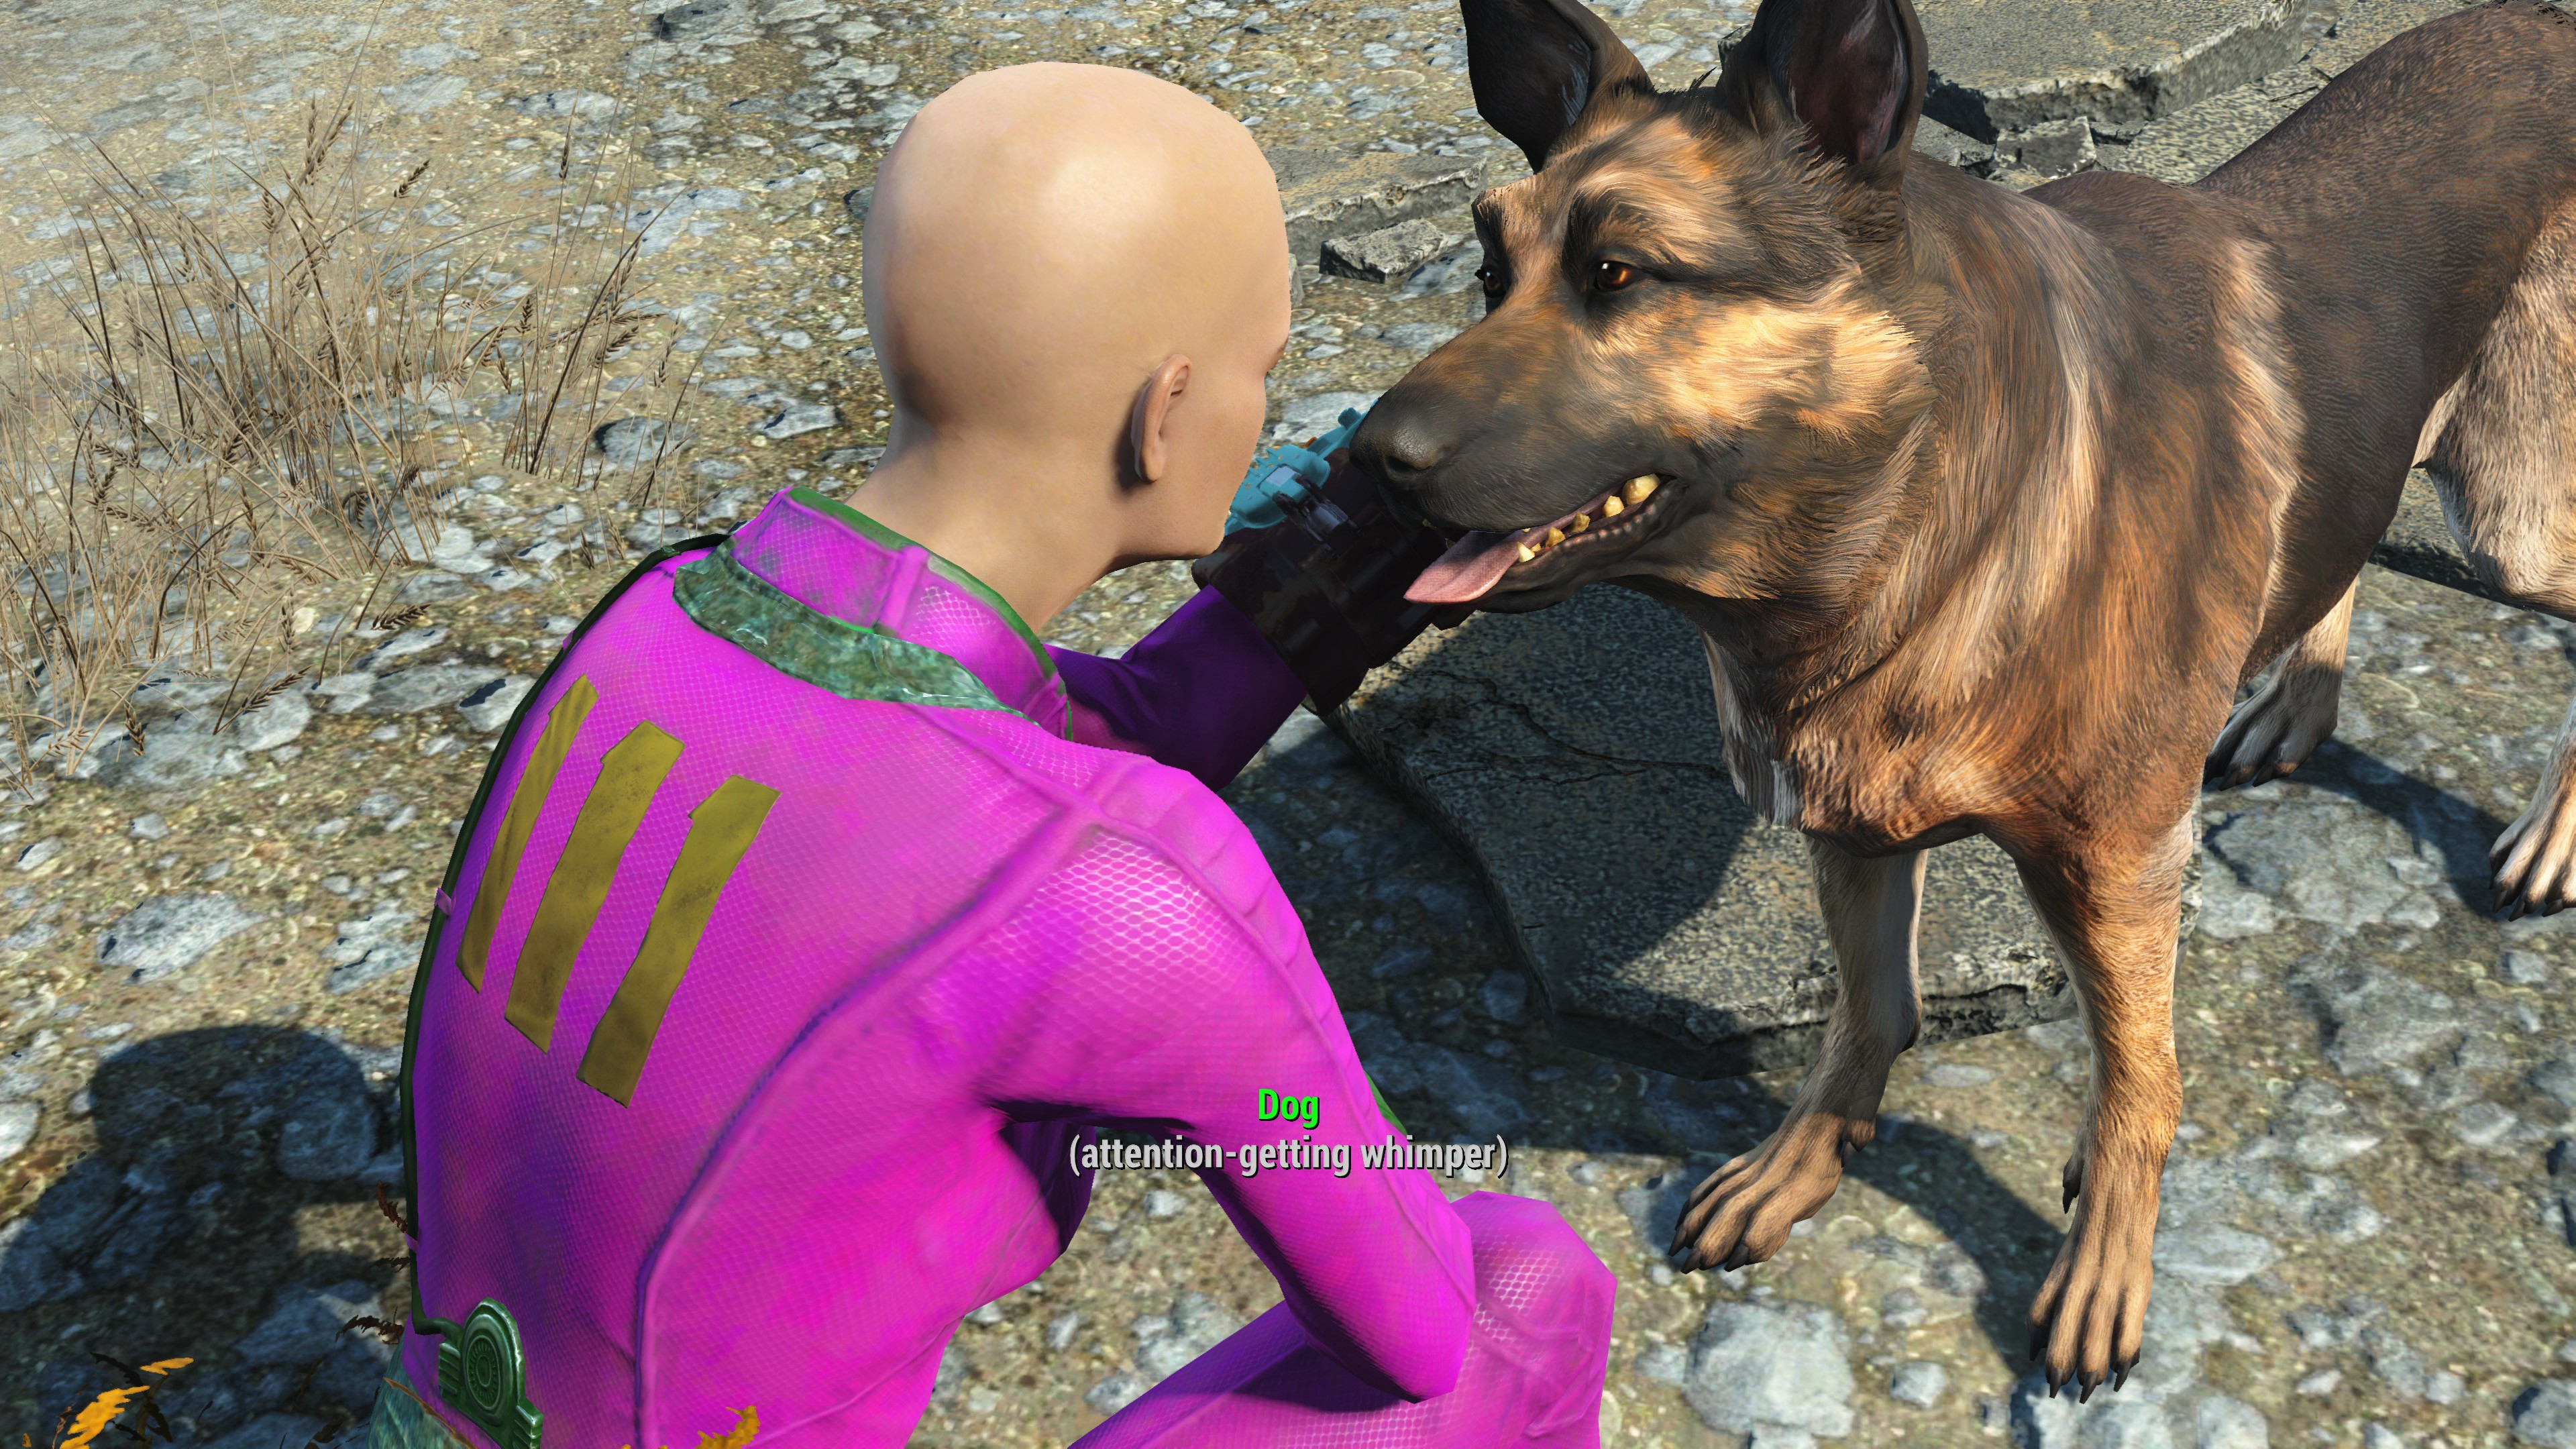 Susan's Fallout 4 character petting Dogmeat, a German Shepherd character/companion.